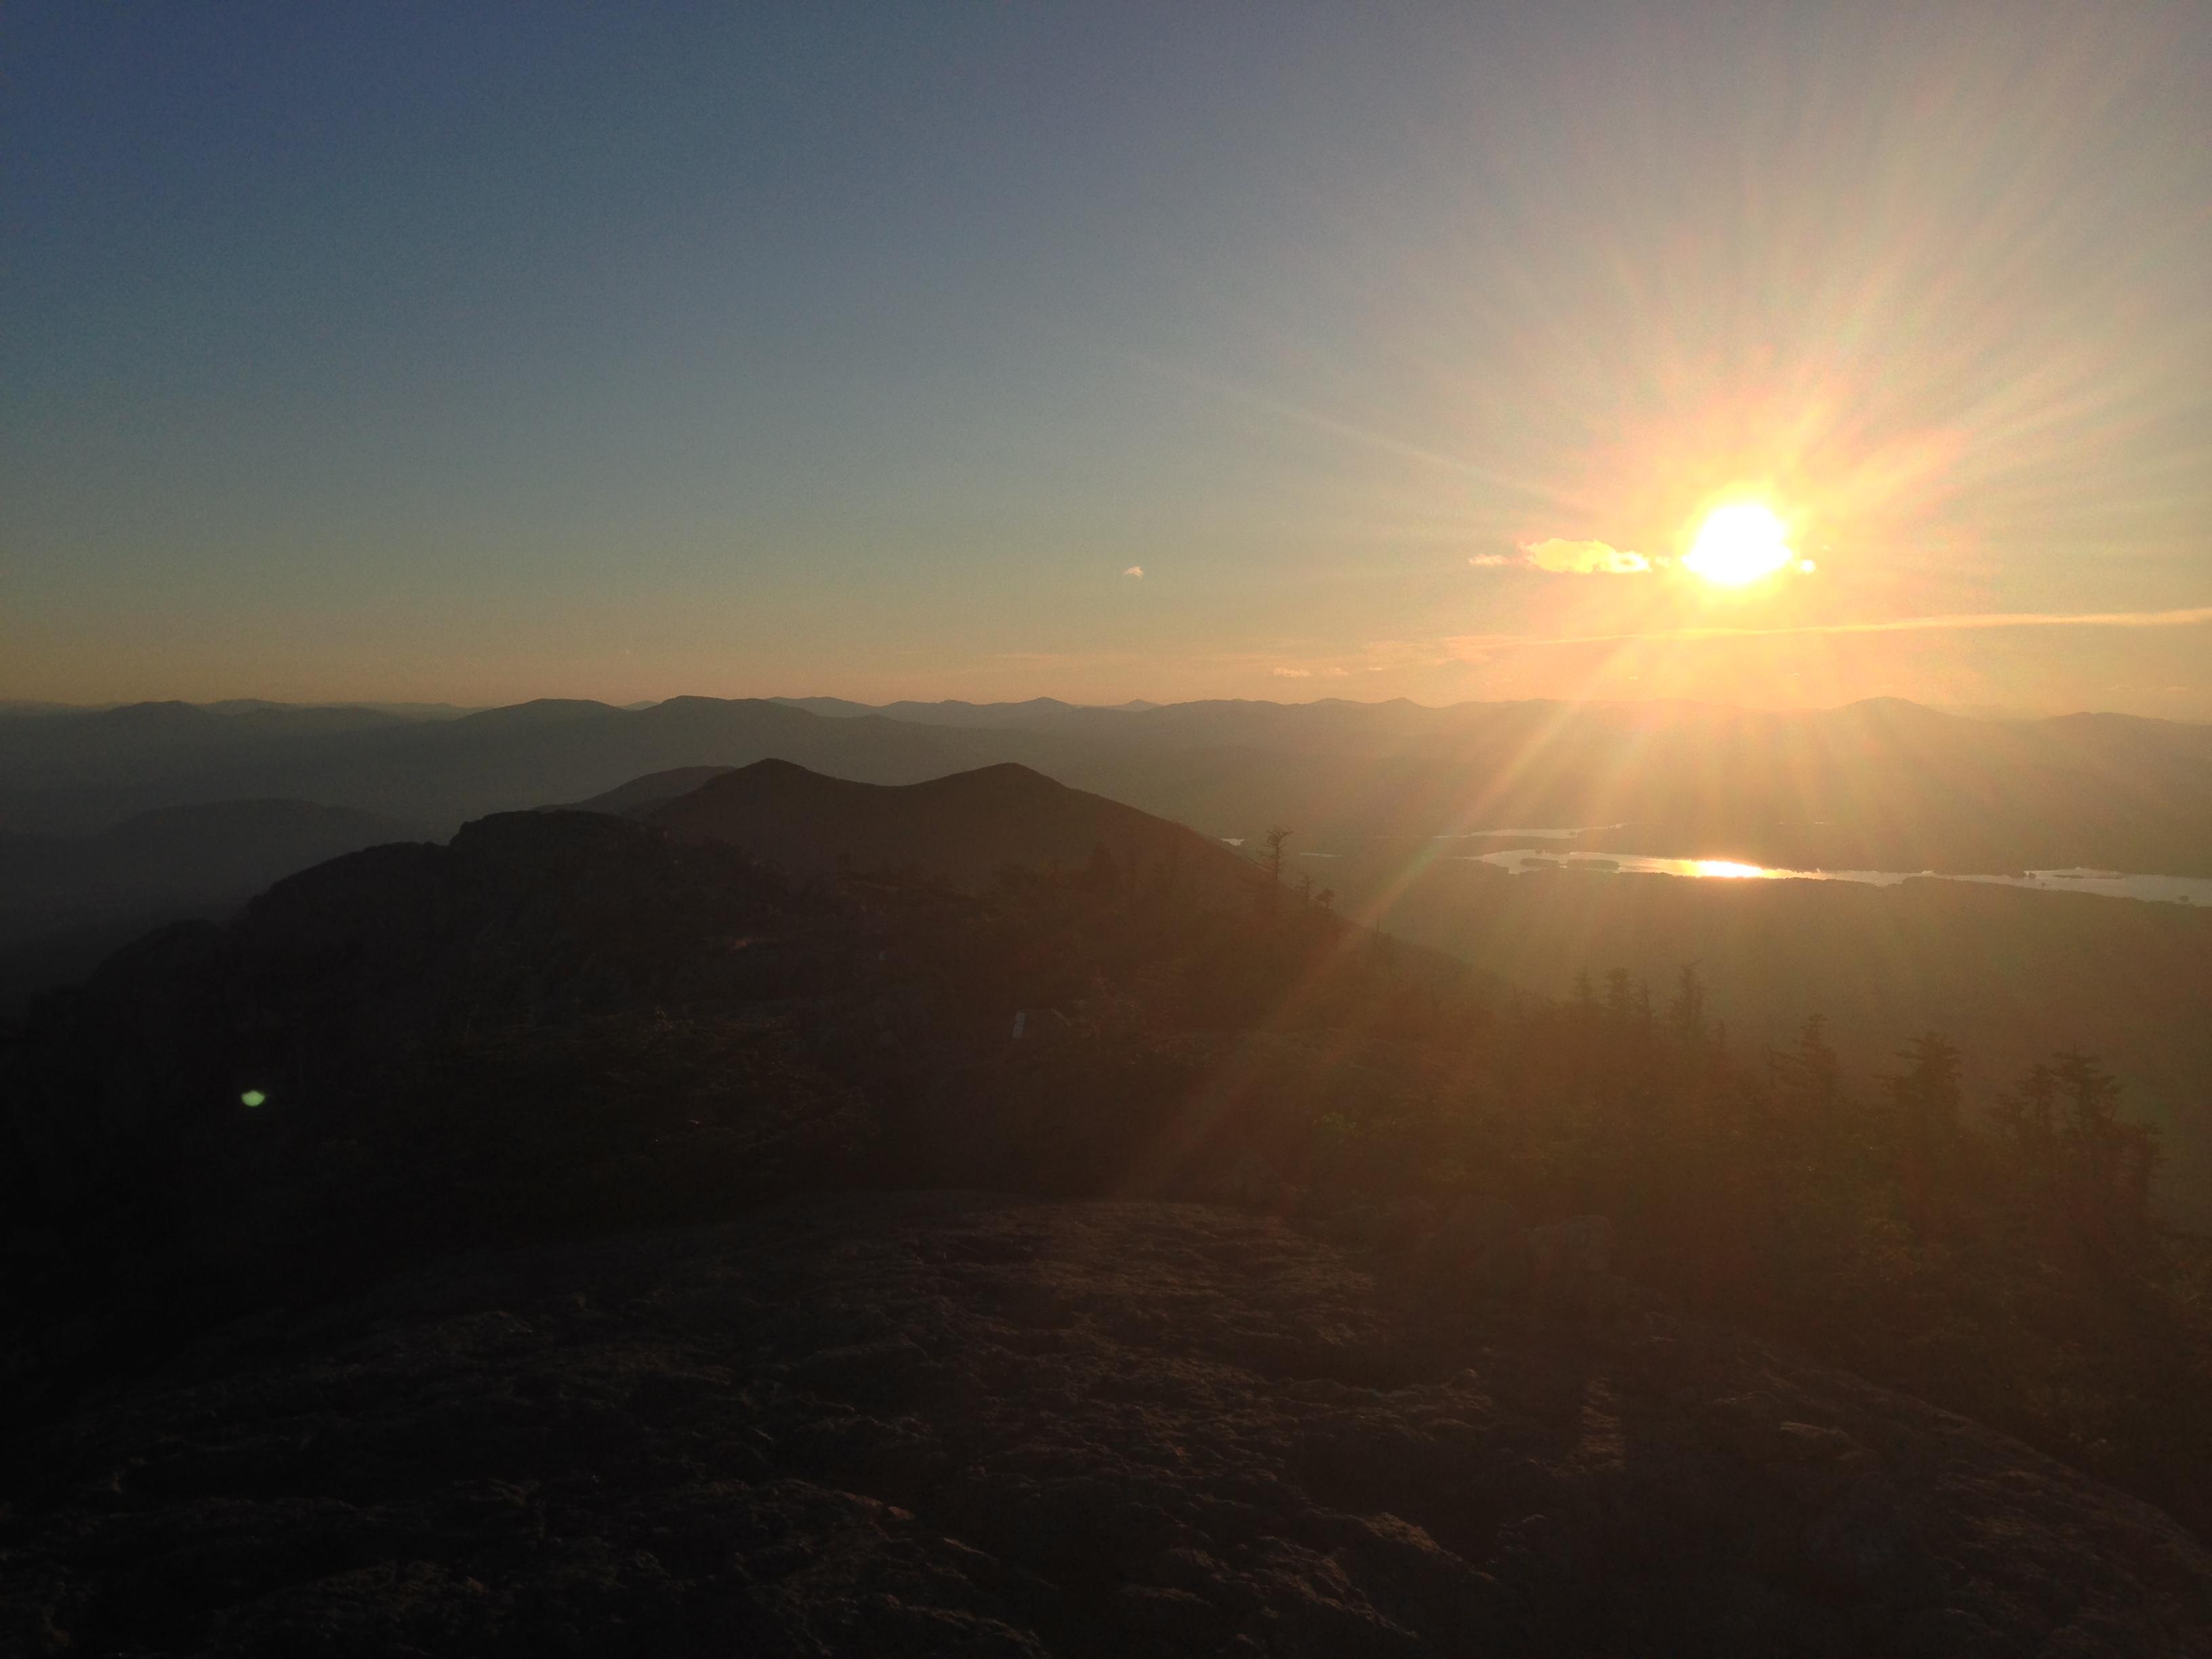 Bigelow West Peak, Sunset